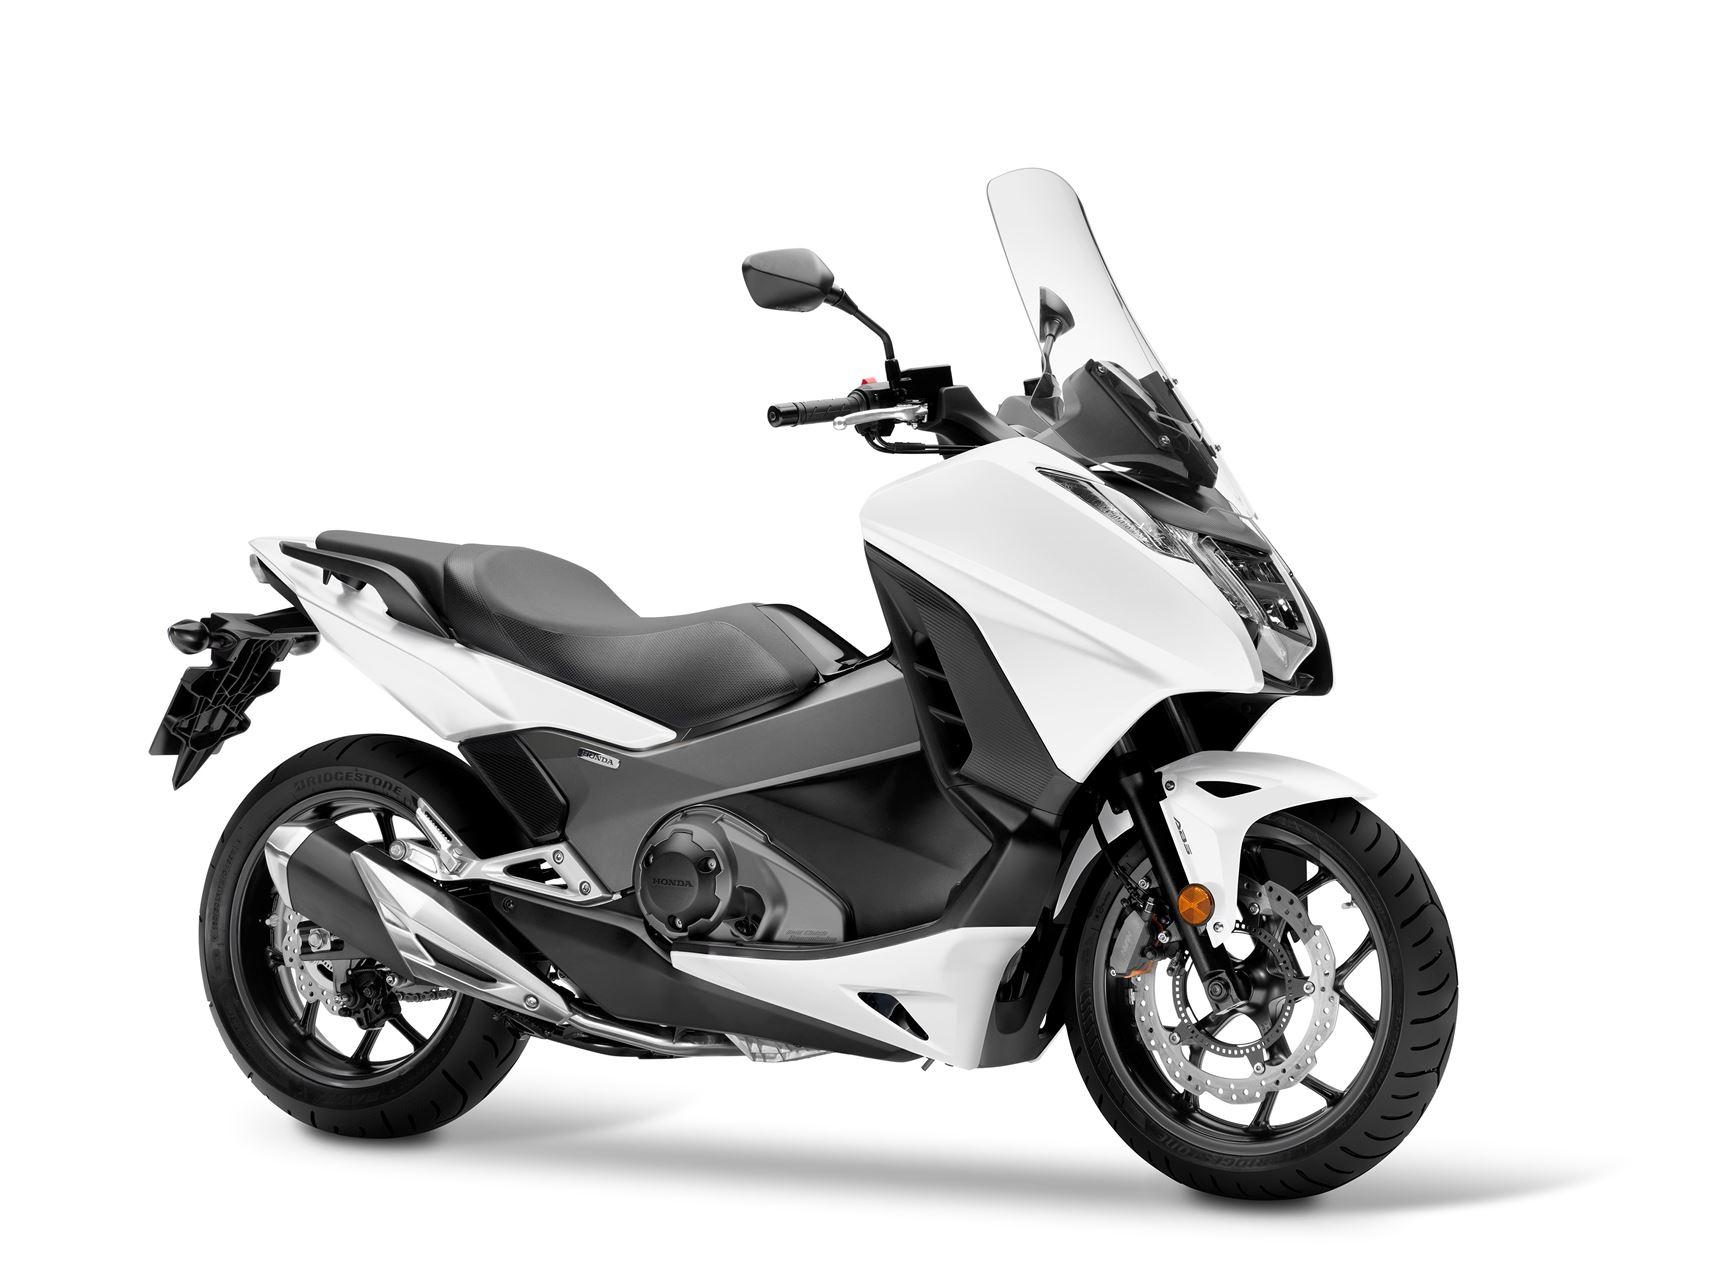 honda integra 750 scooter scooters andar de moto. Black Bedroom Furniture Sets. Home Design Ideas